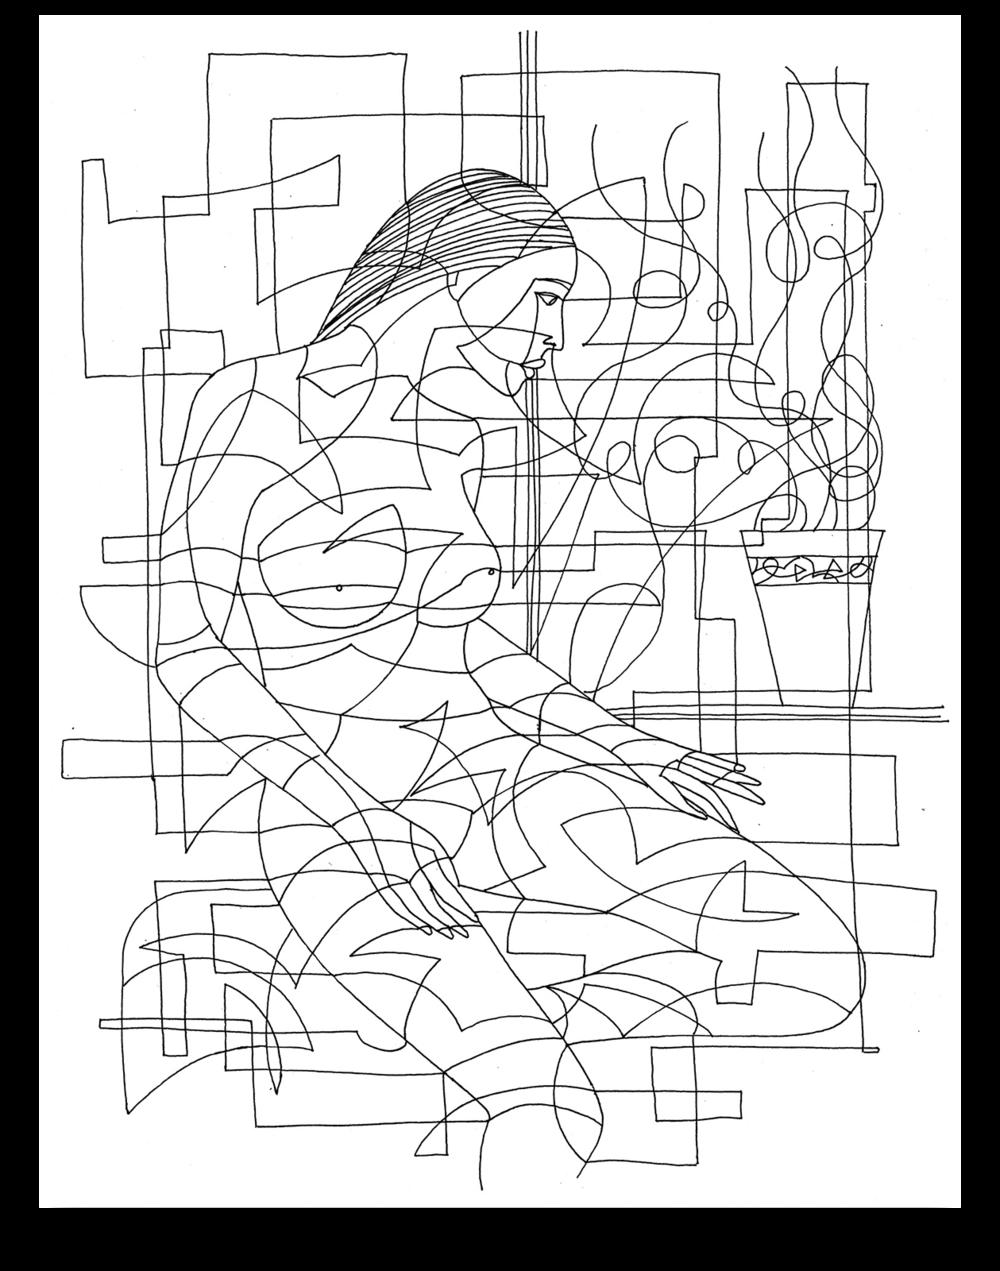 2007 Female Figure copy.png